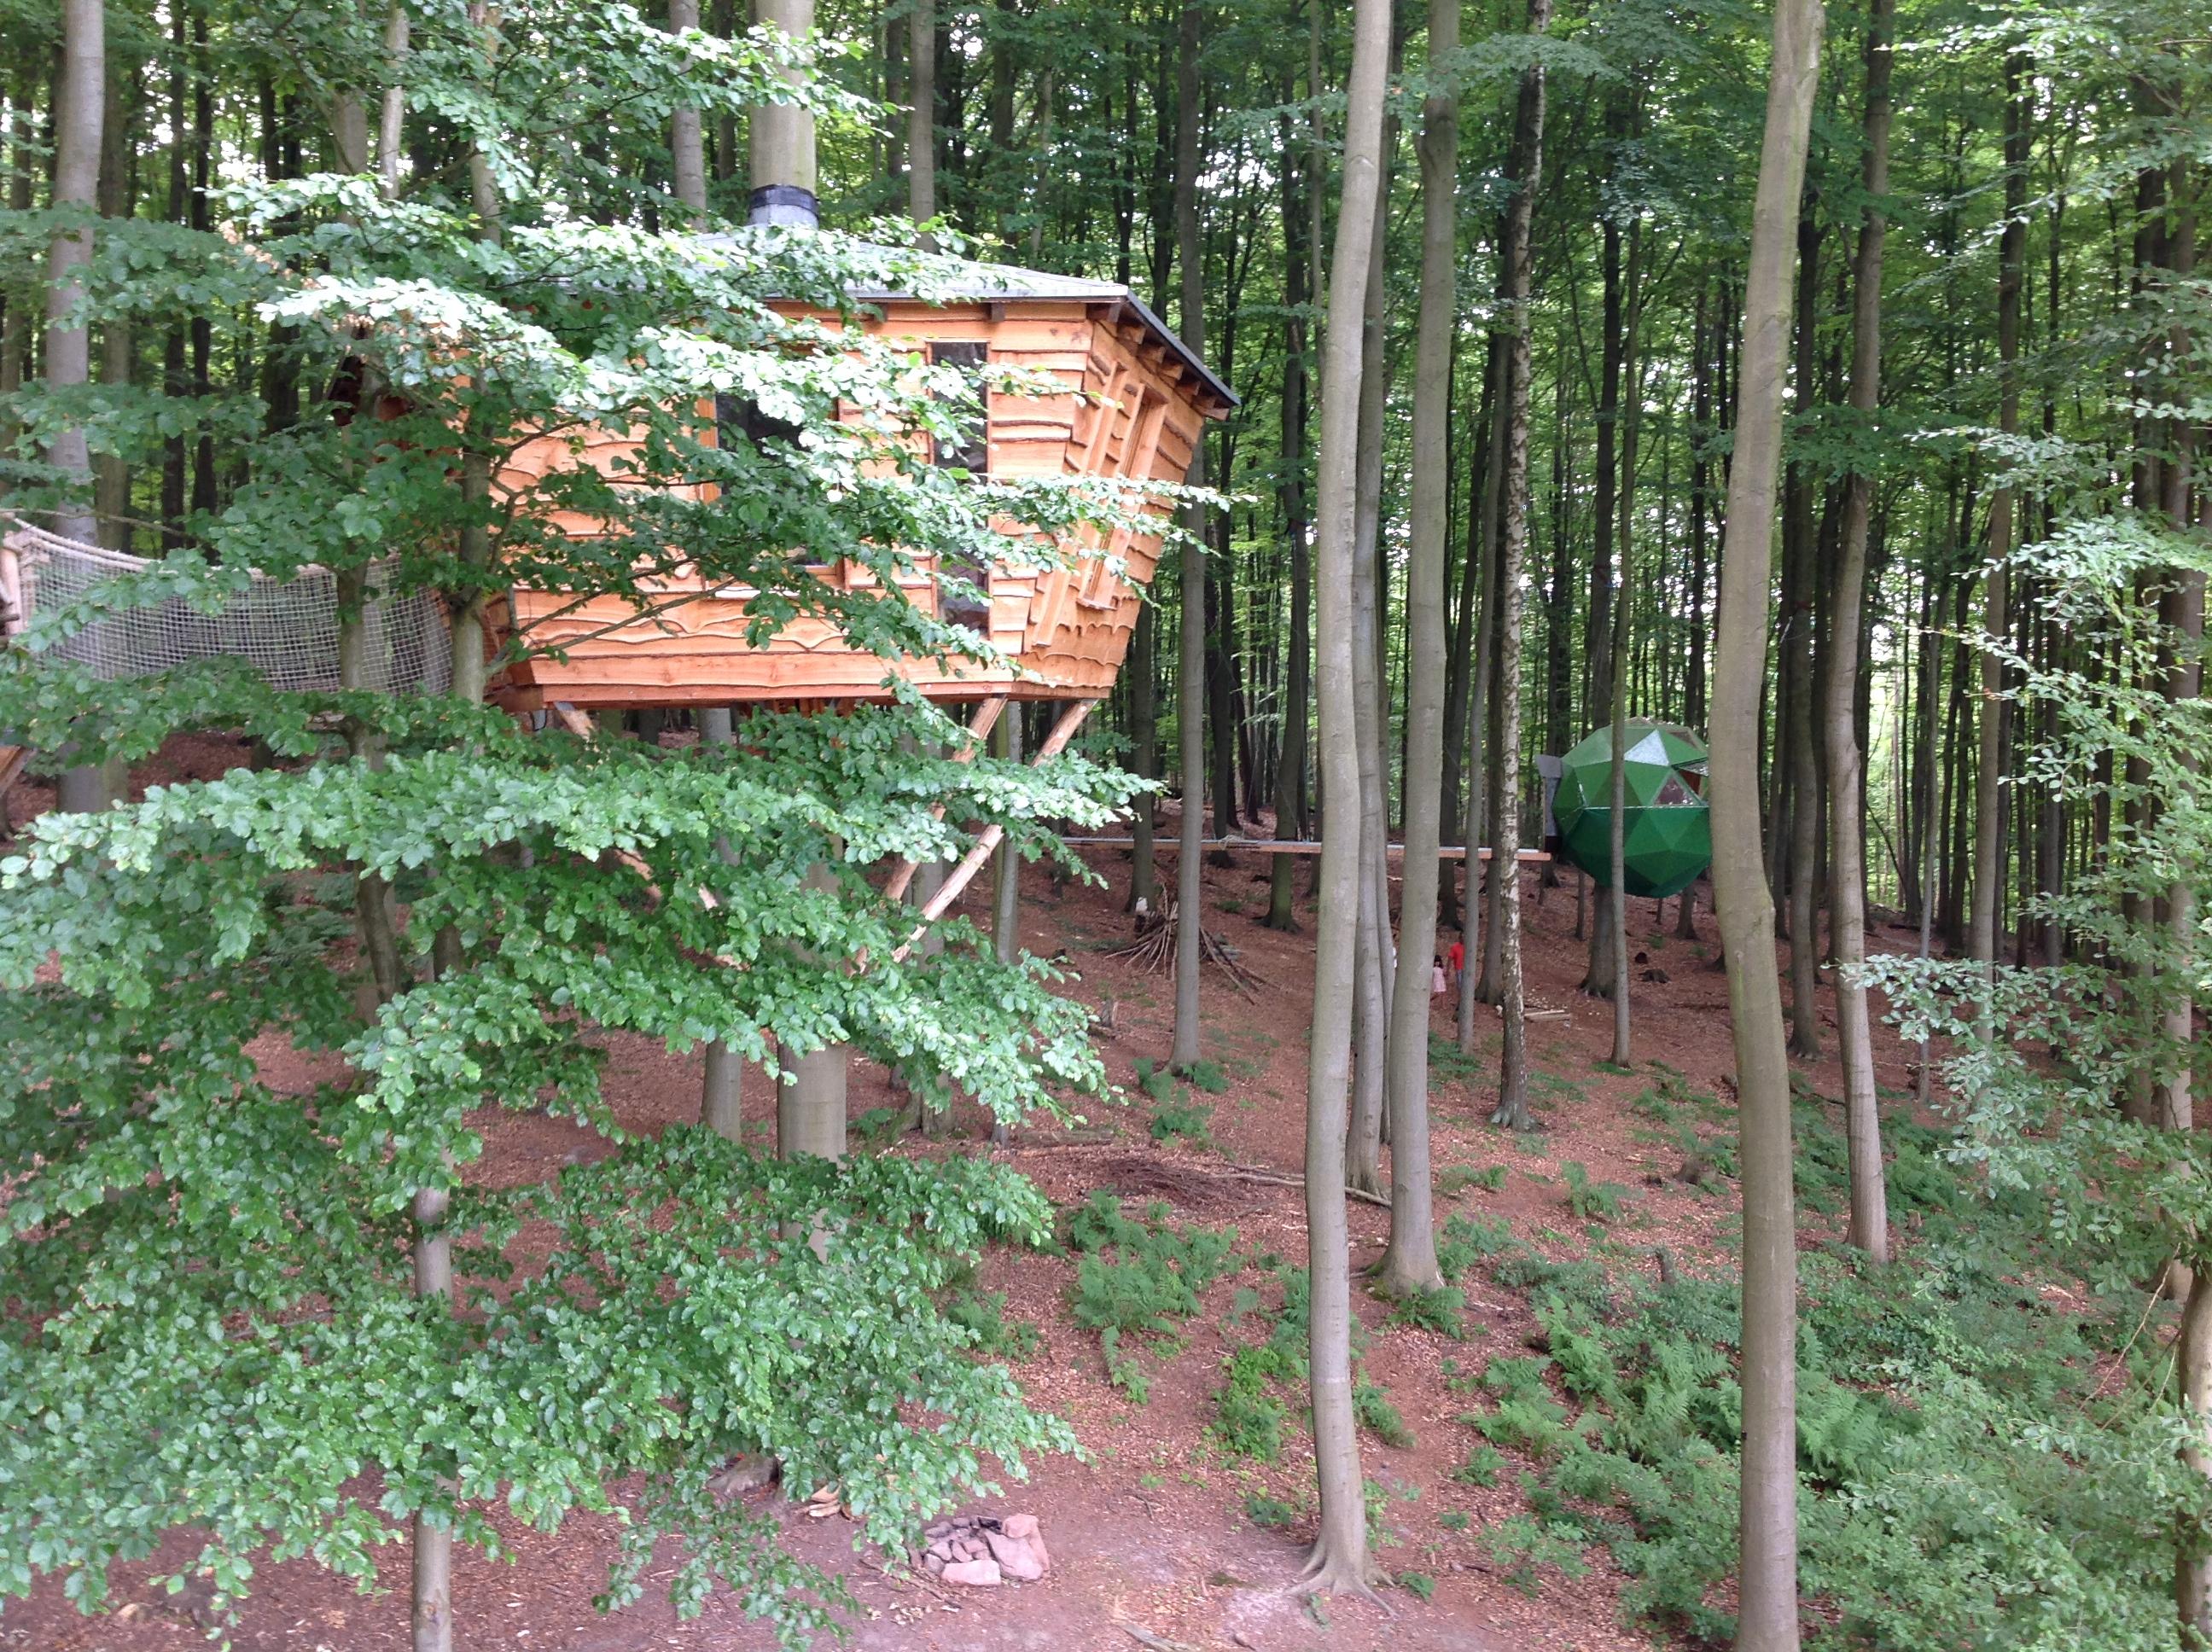 Baumhausdorf Robins Nest, Foto IK